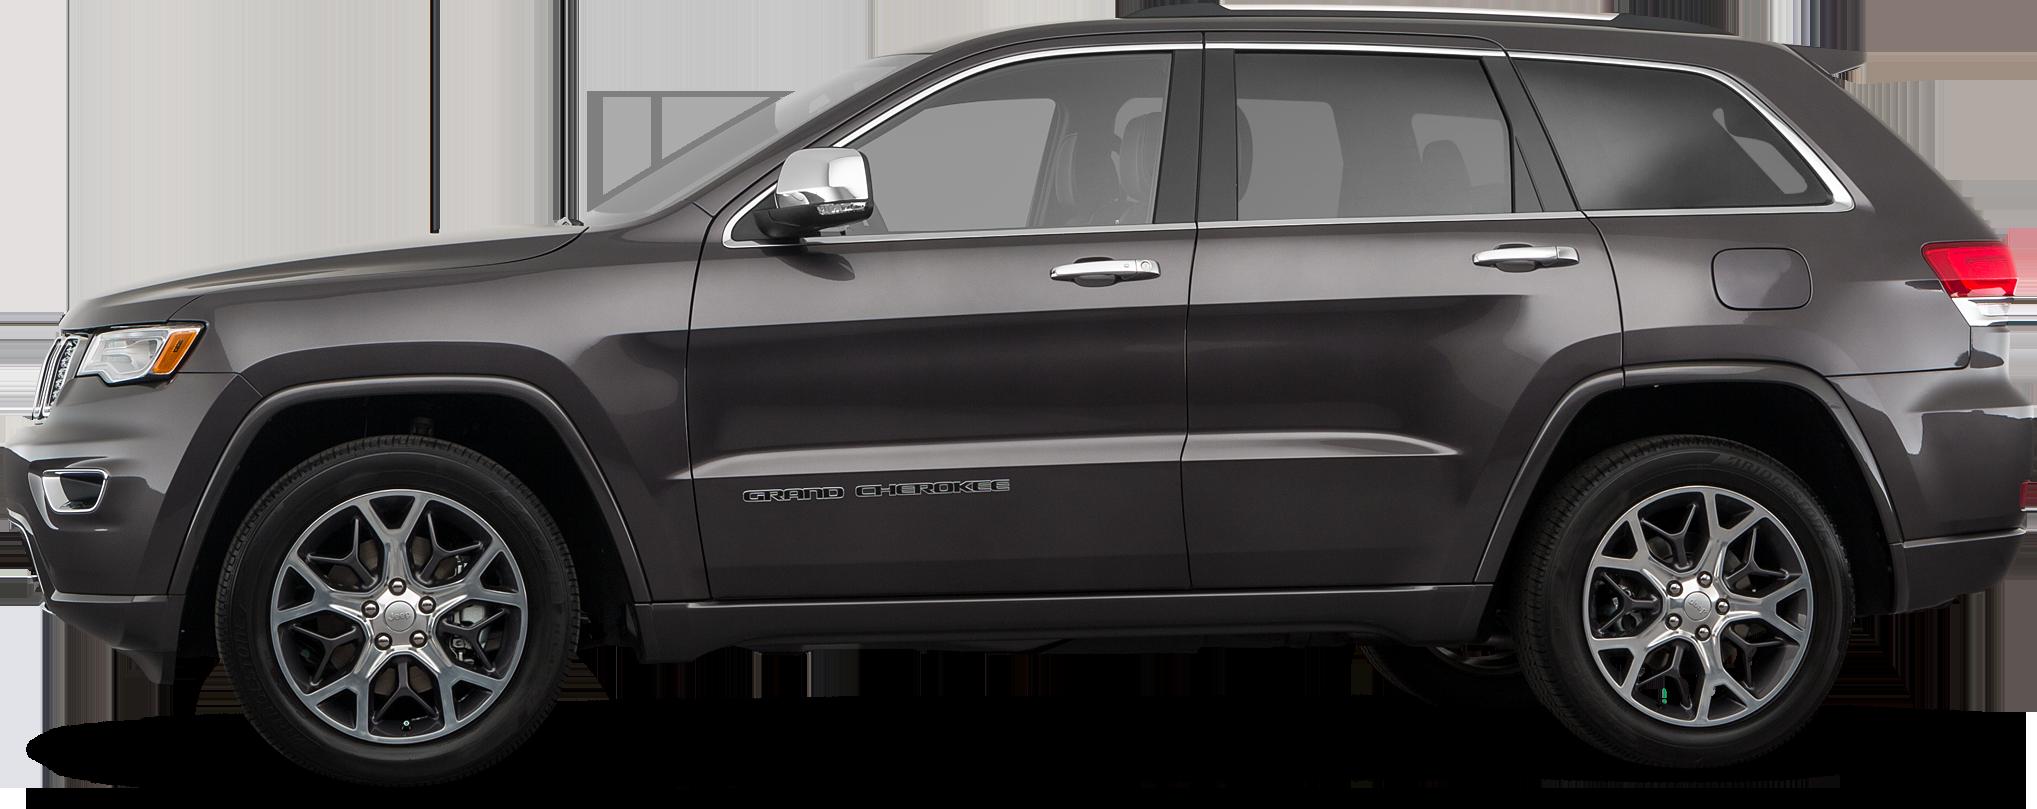 2019 Jeep Grand Cherokee SUV Overland 4x4